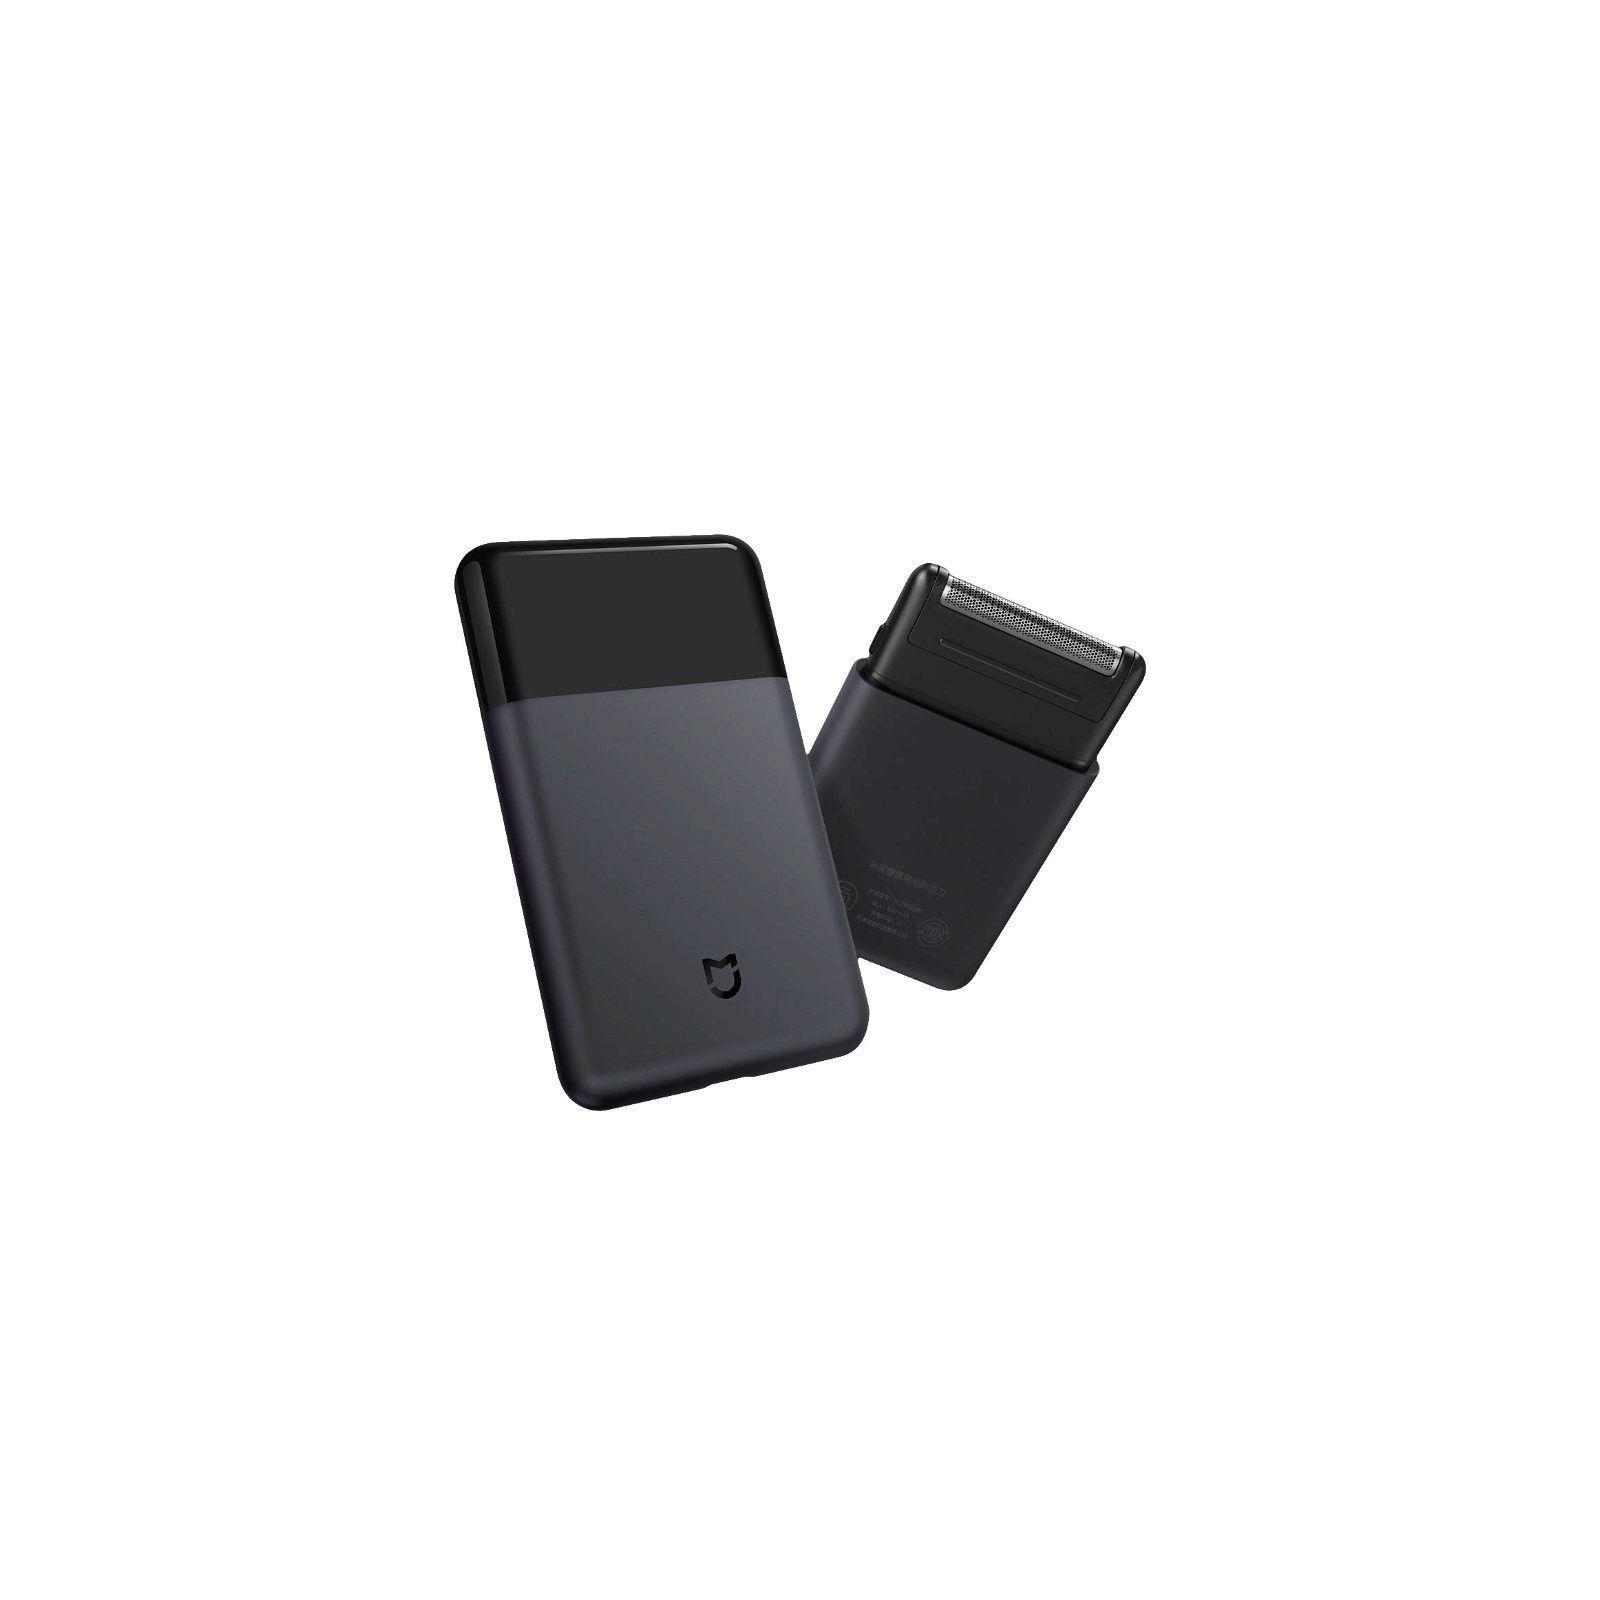 Электробритва Xiaomi MiJia Portable Electric Shaver Black изображение 4